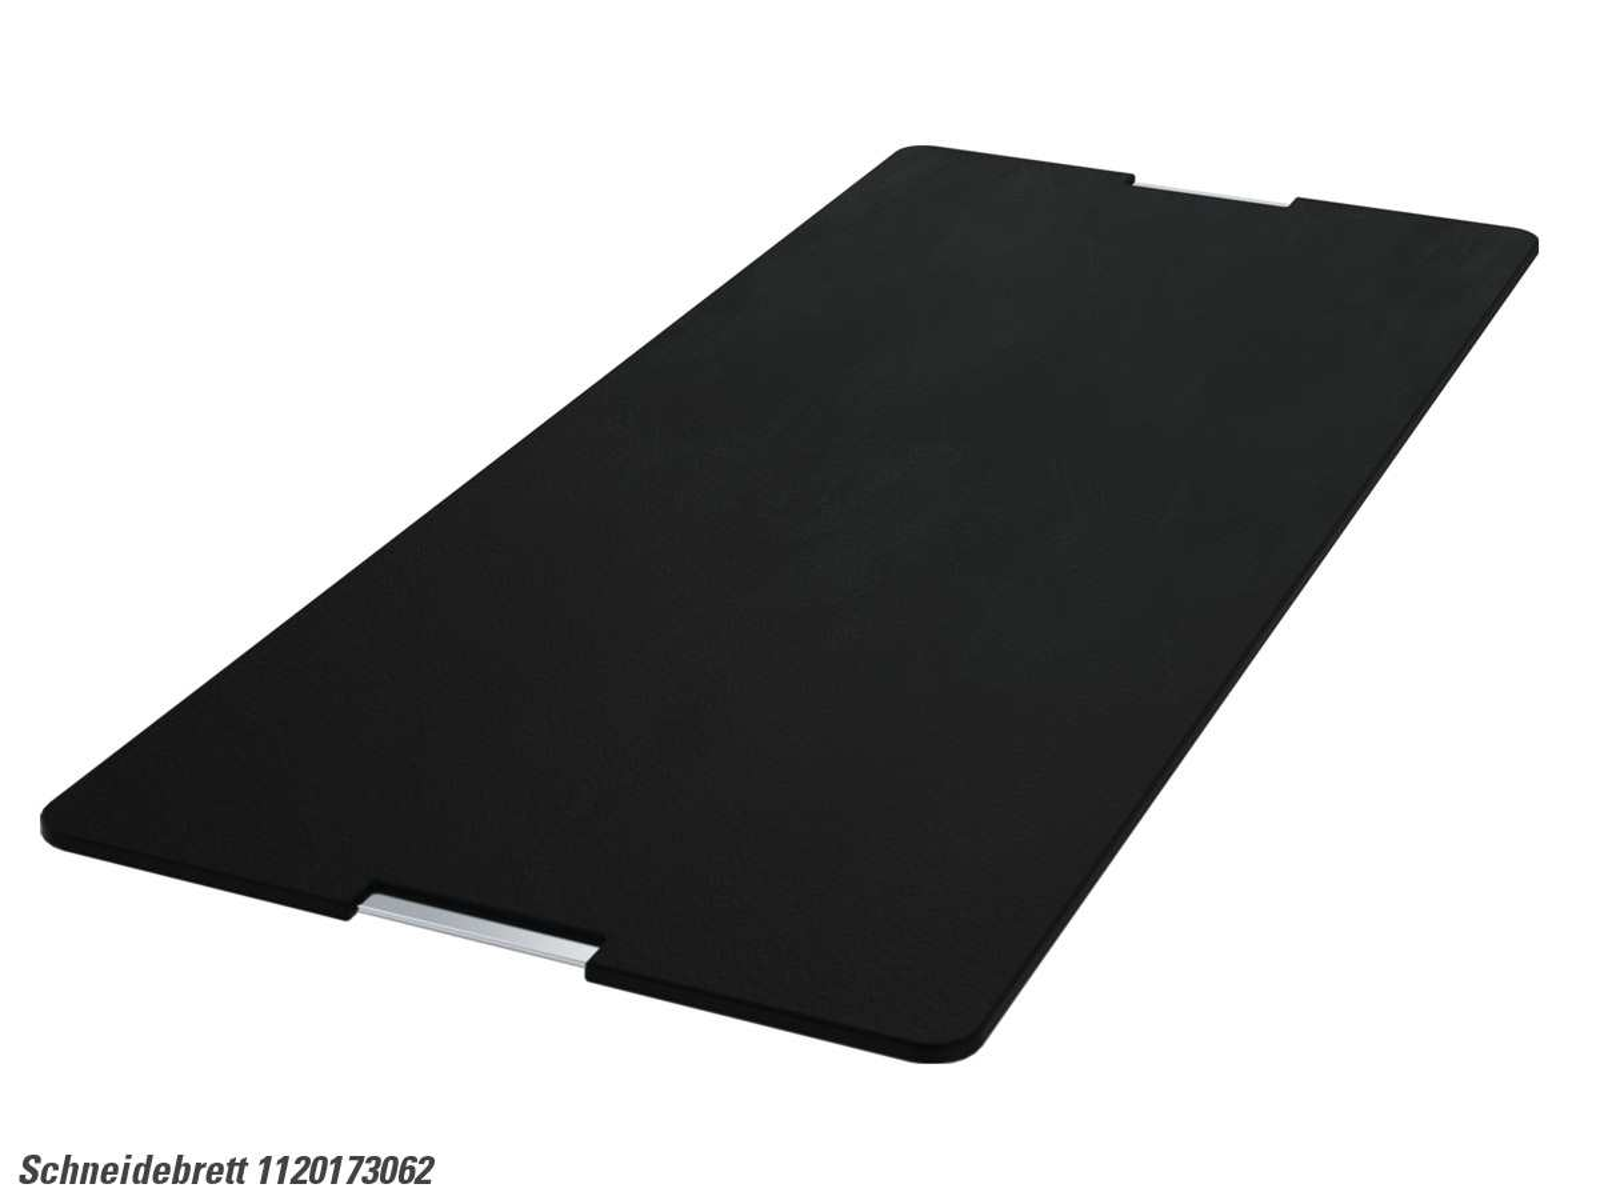 Franke 112.0173.062 Kunststoffschneidebrett schwarz